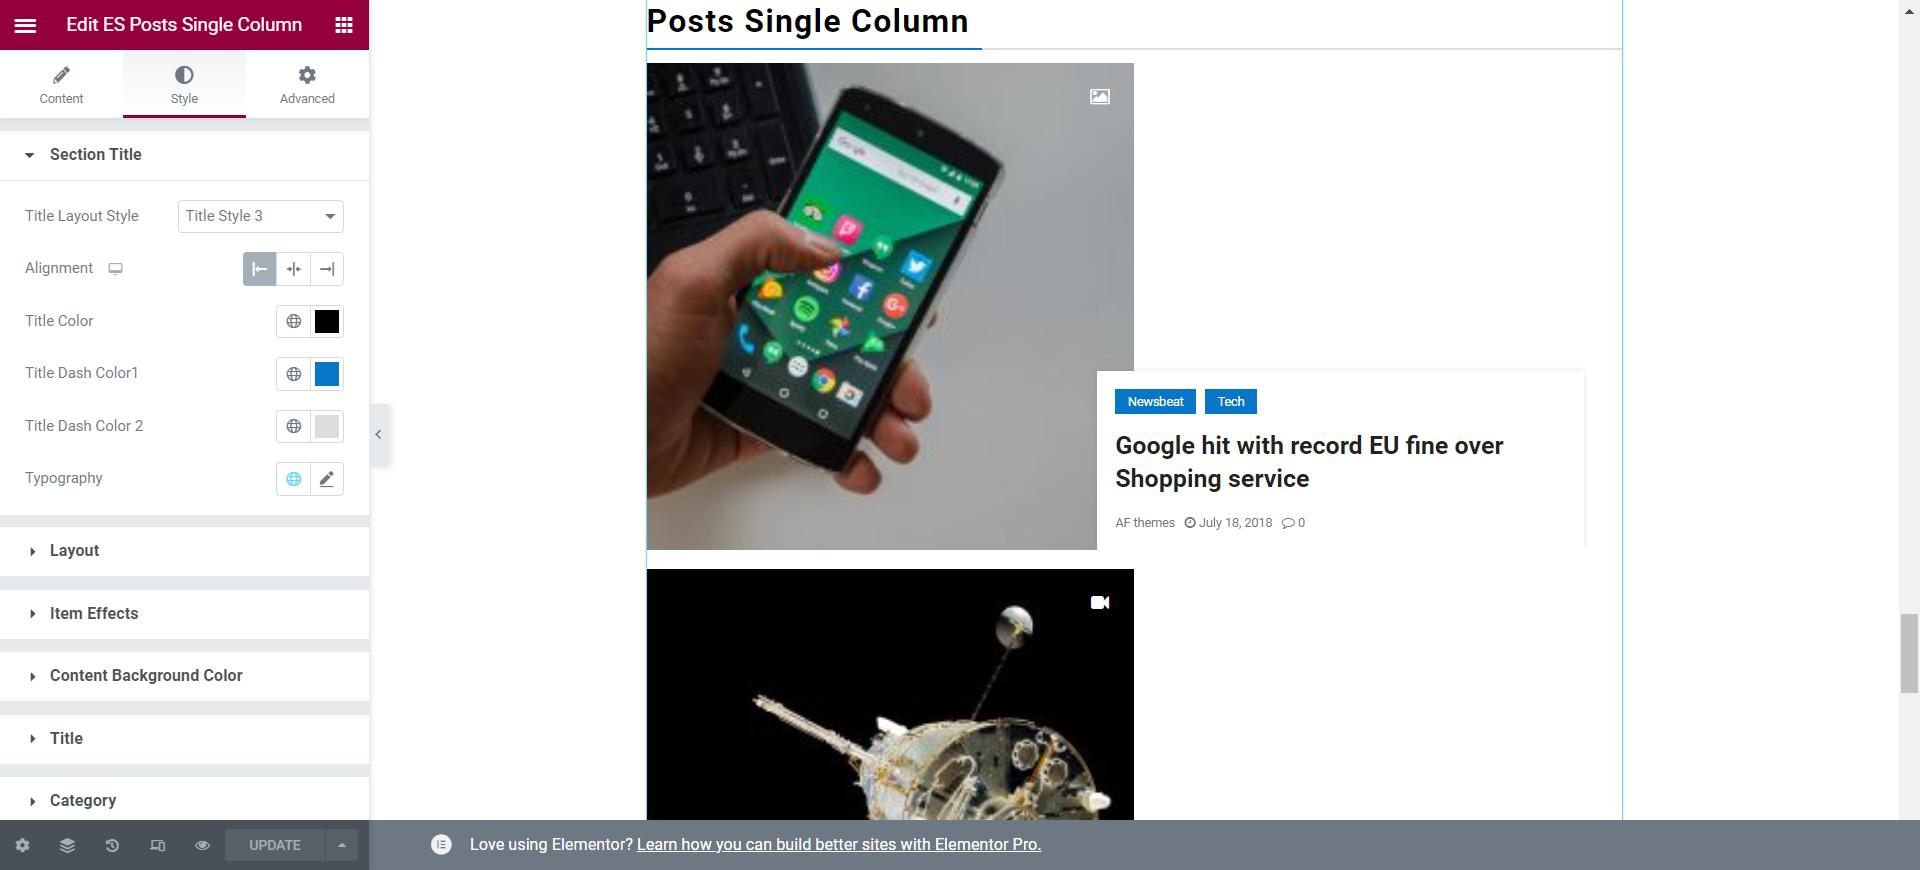 Post Single Column